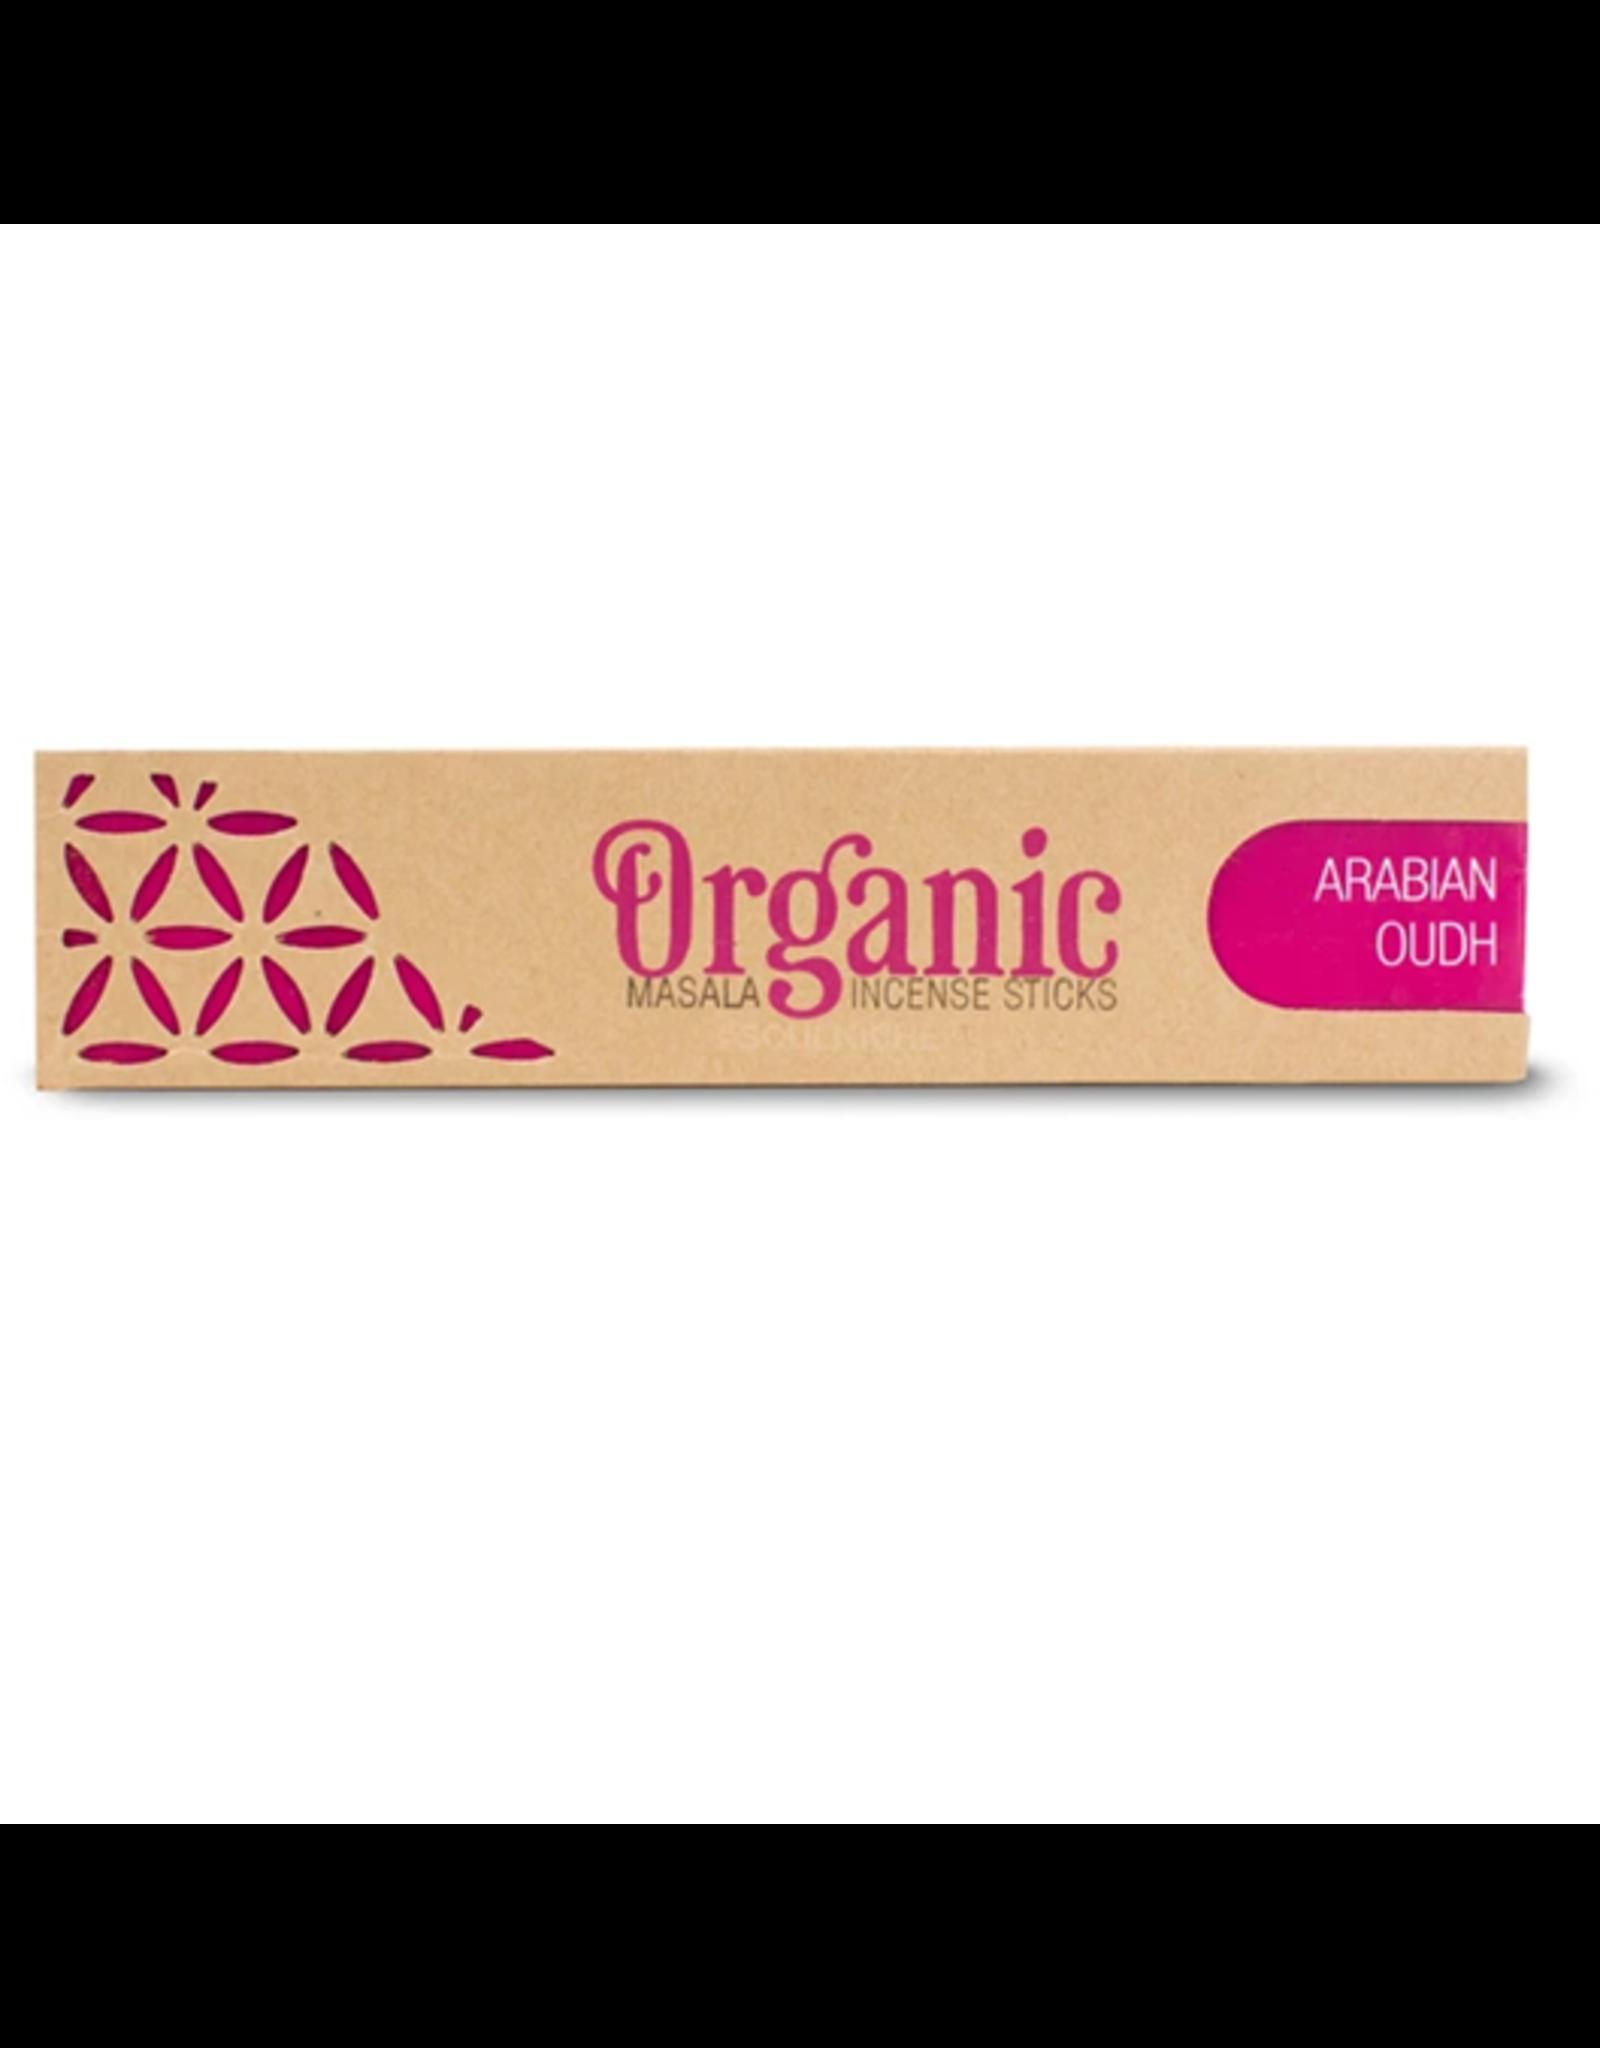 Organic Goodness Arabian oudh